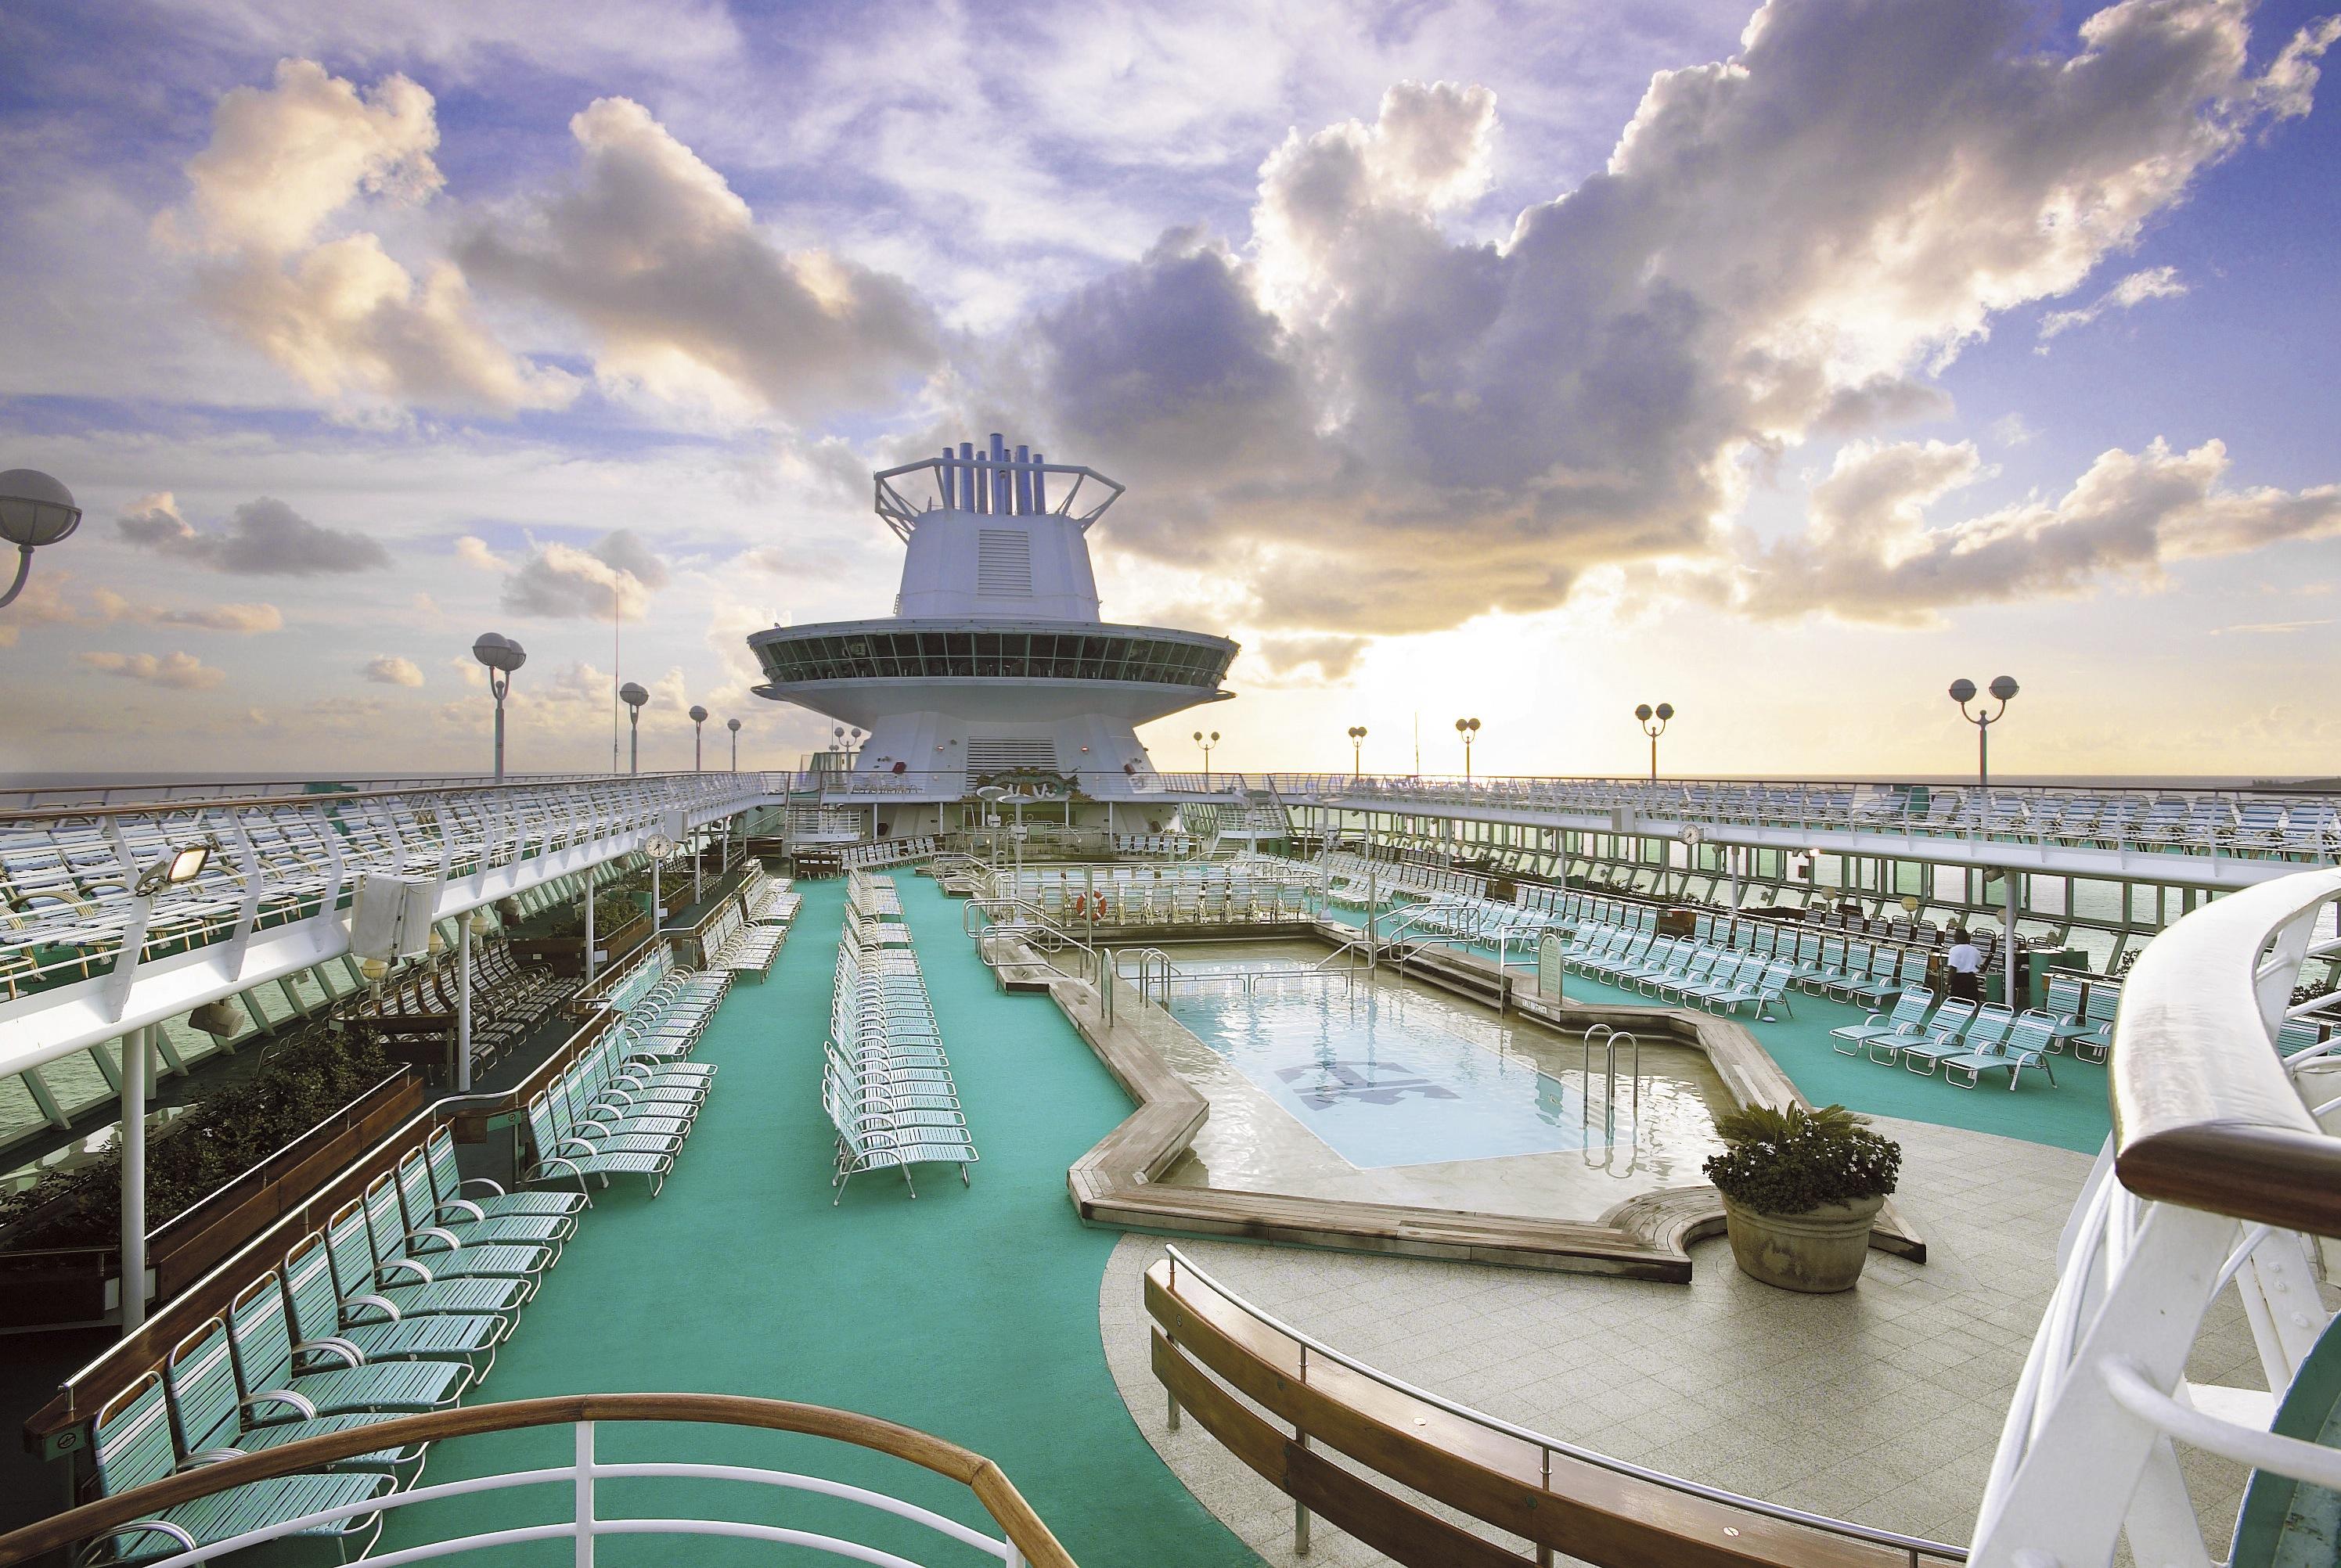 Royal Caribbean International Majesty of the Seas Exterior Solarium.jpeg